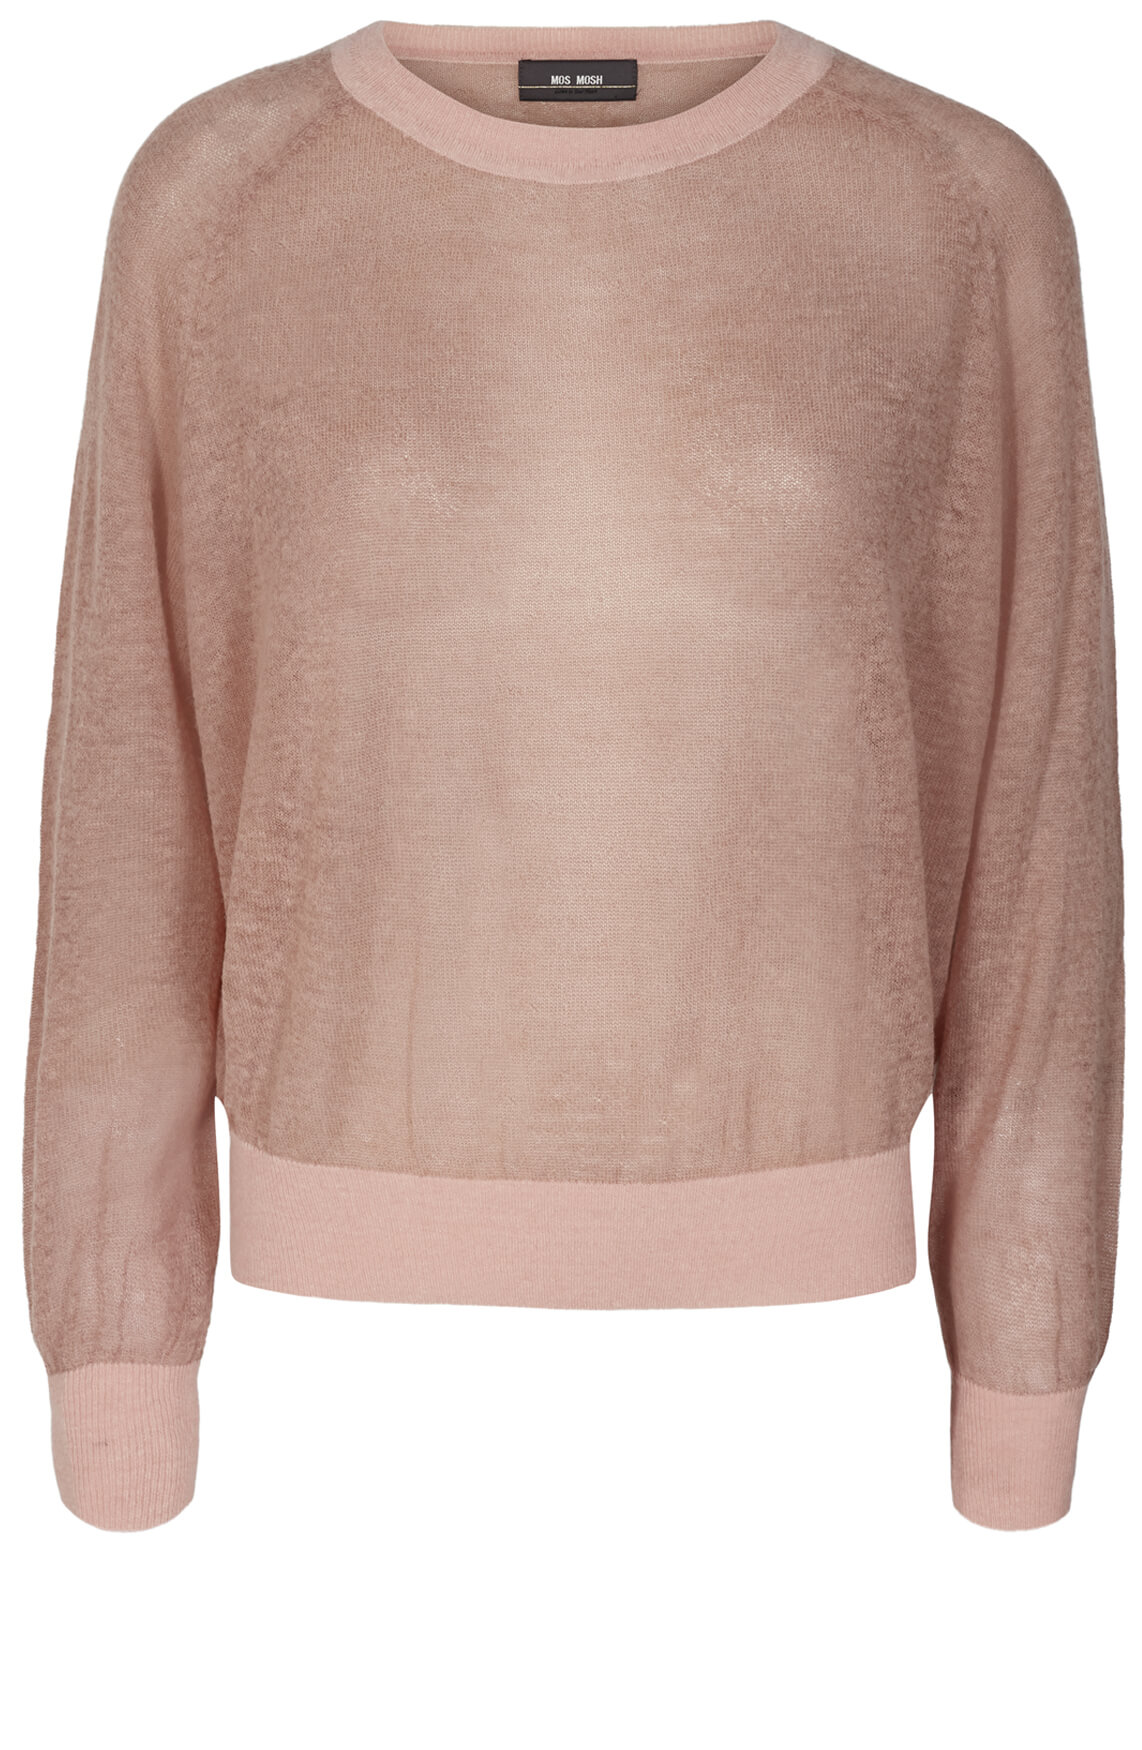 Mos Mosh Dames Fijngebreide pullover roze